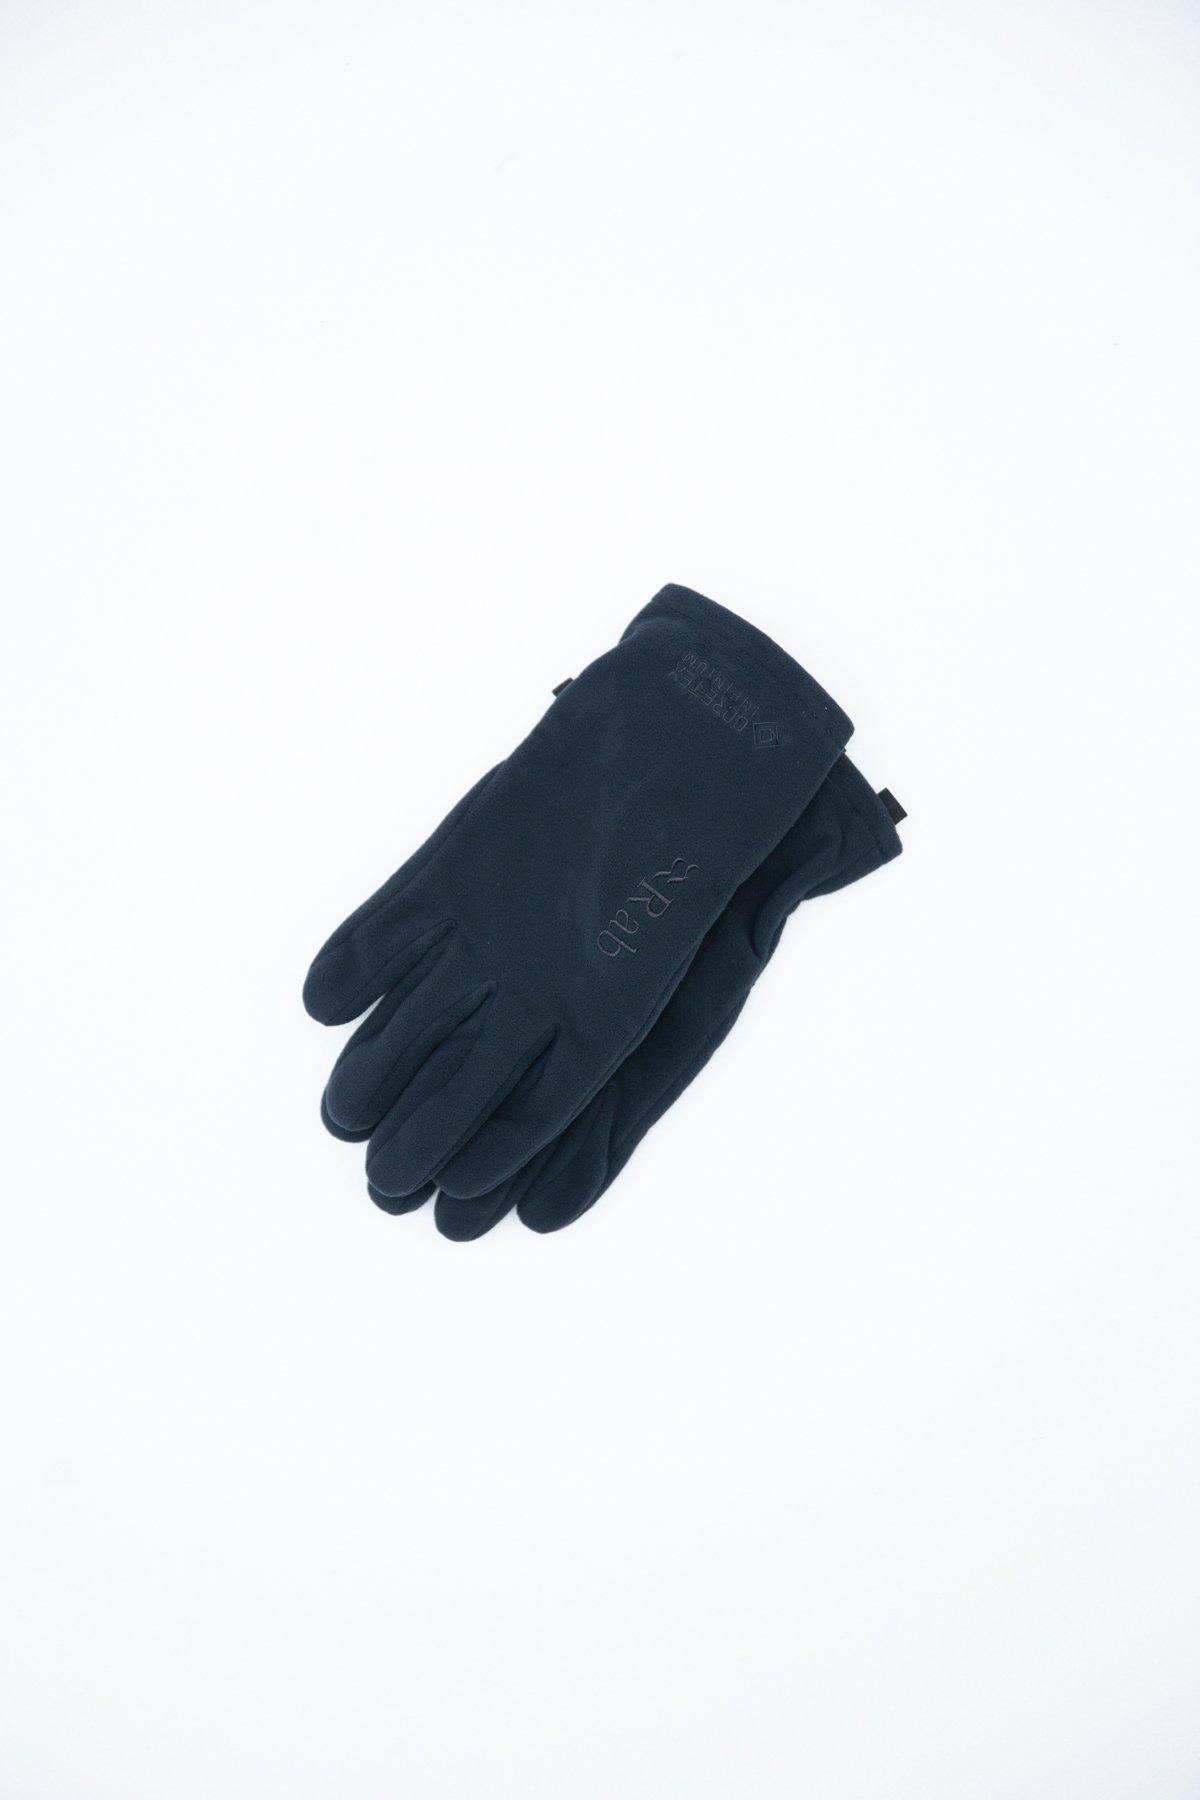 Rab / Infinium Windproof Glove